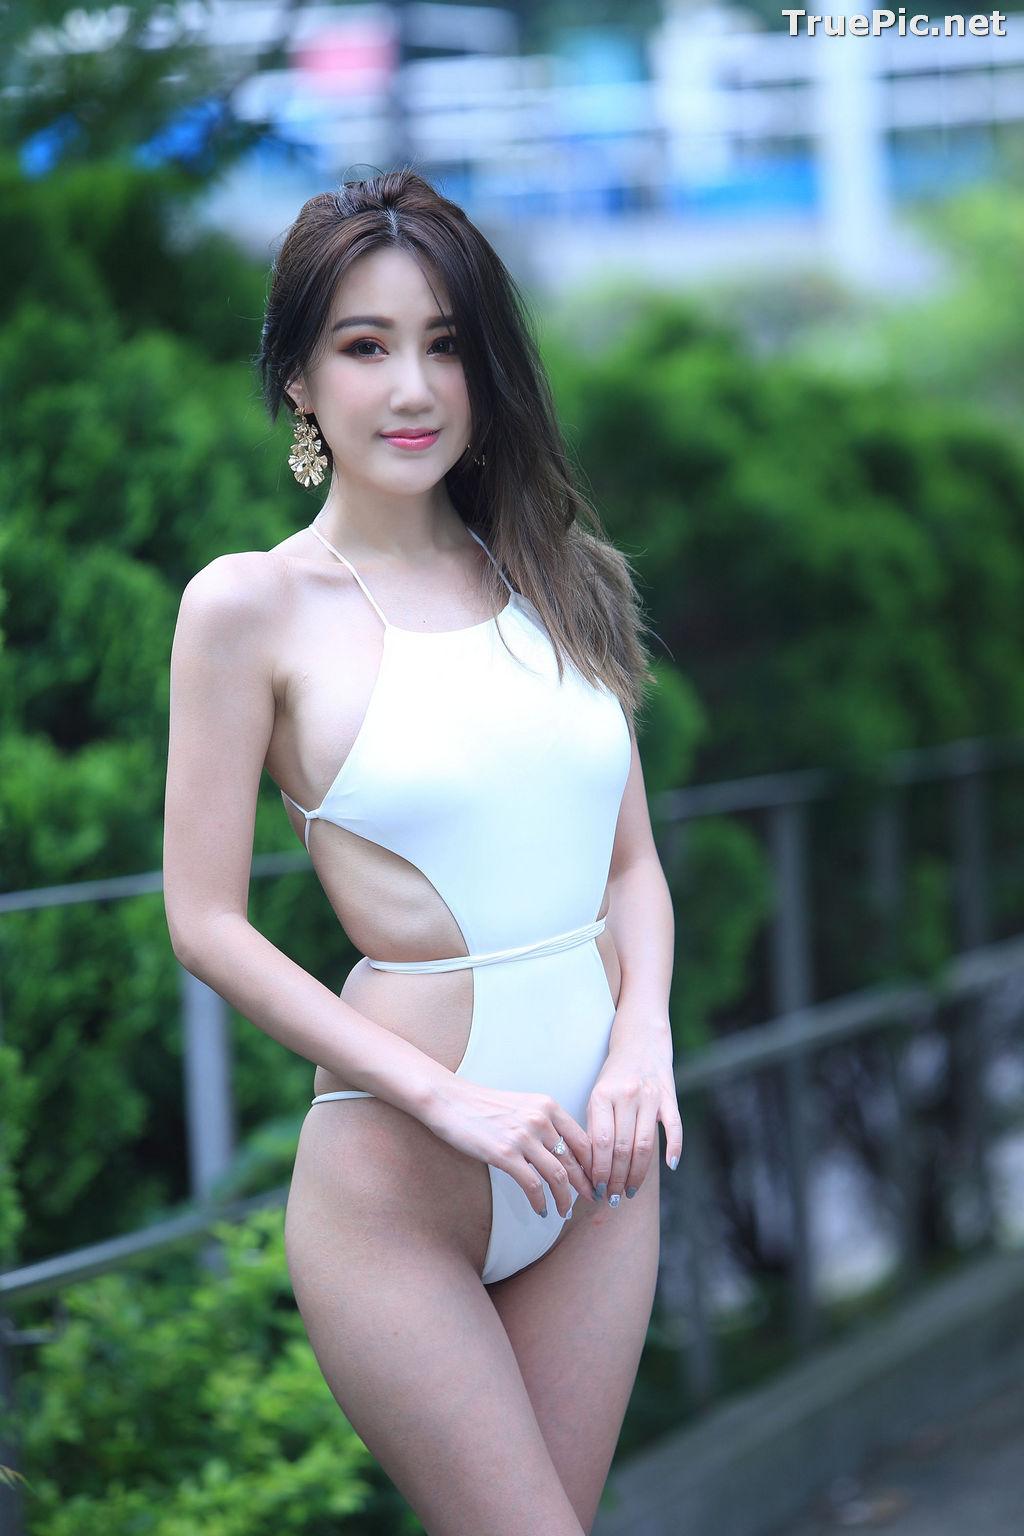 Image Taiwanese Beautiful Model - Suki - White Sexy Bikini Girl - TruePic.net - Picture-8